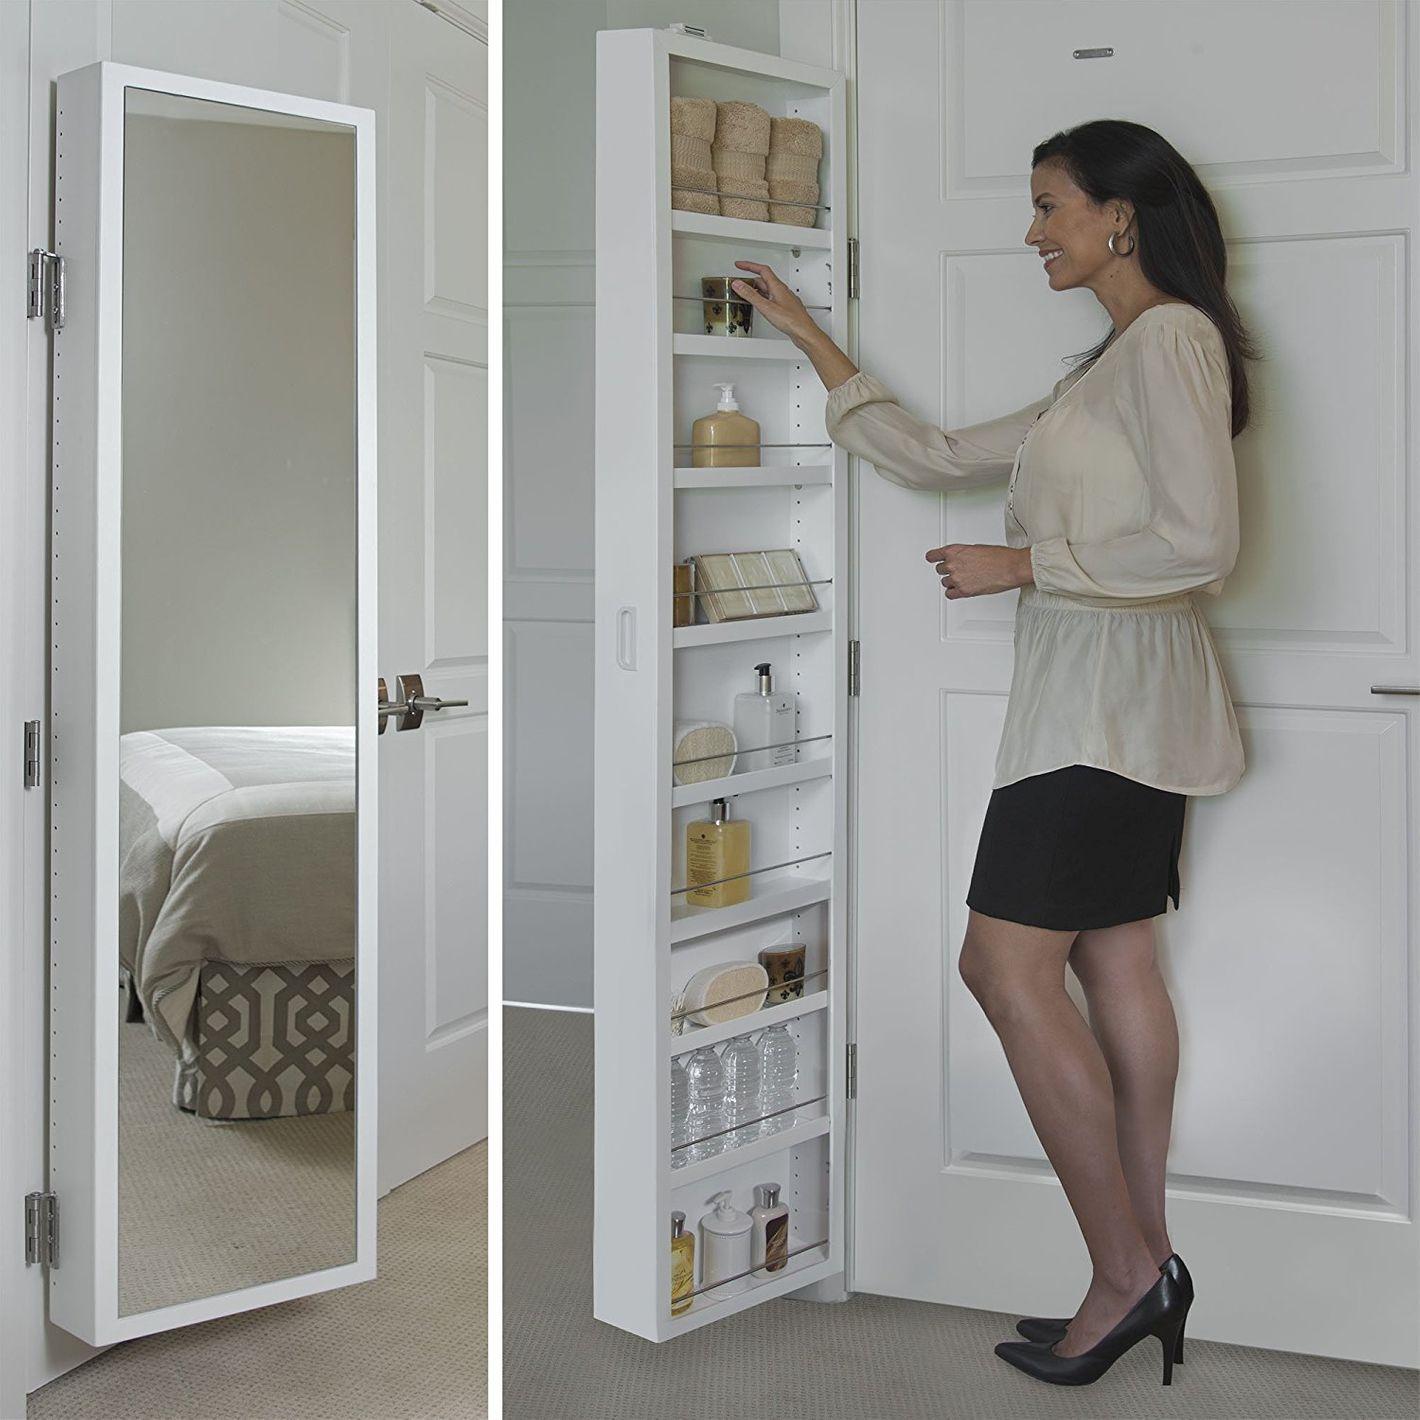 & Best Storage Cabinet is the Cabridor